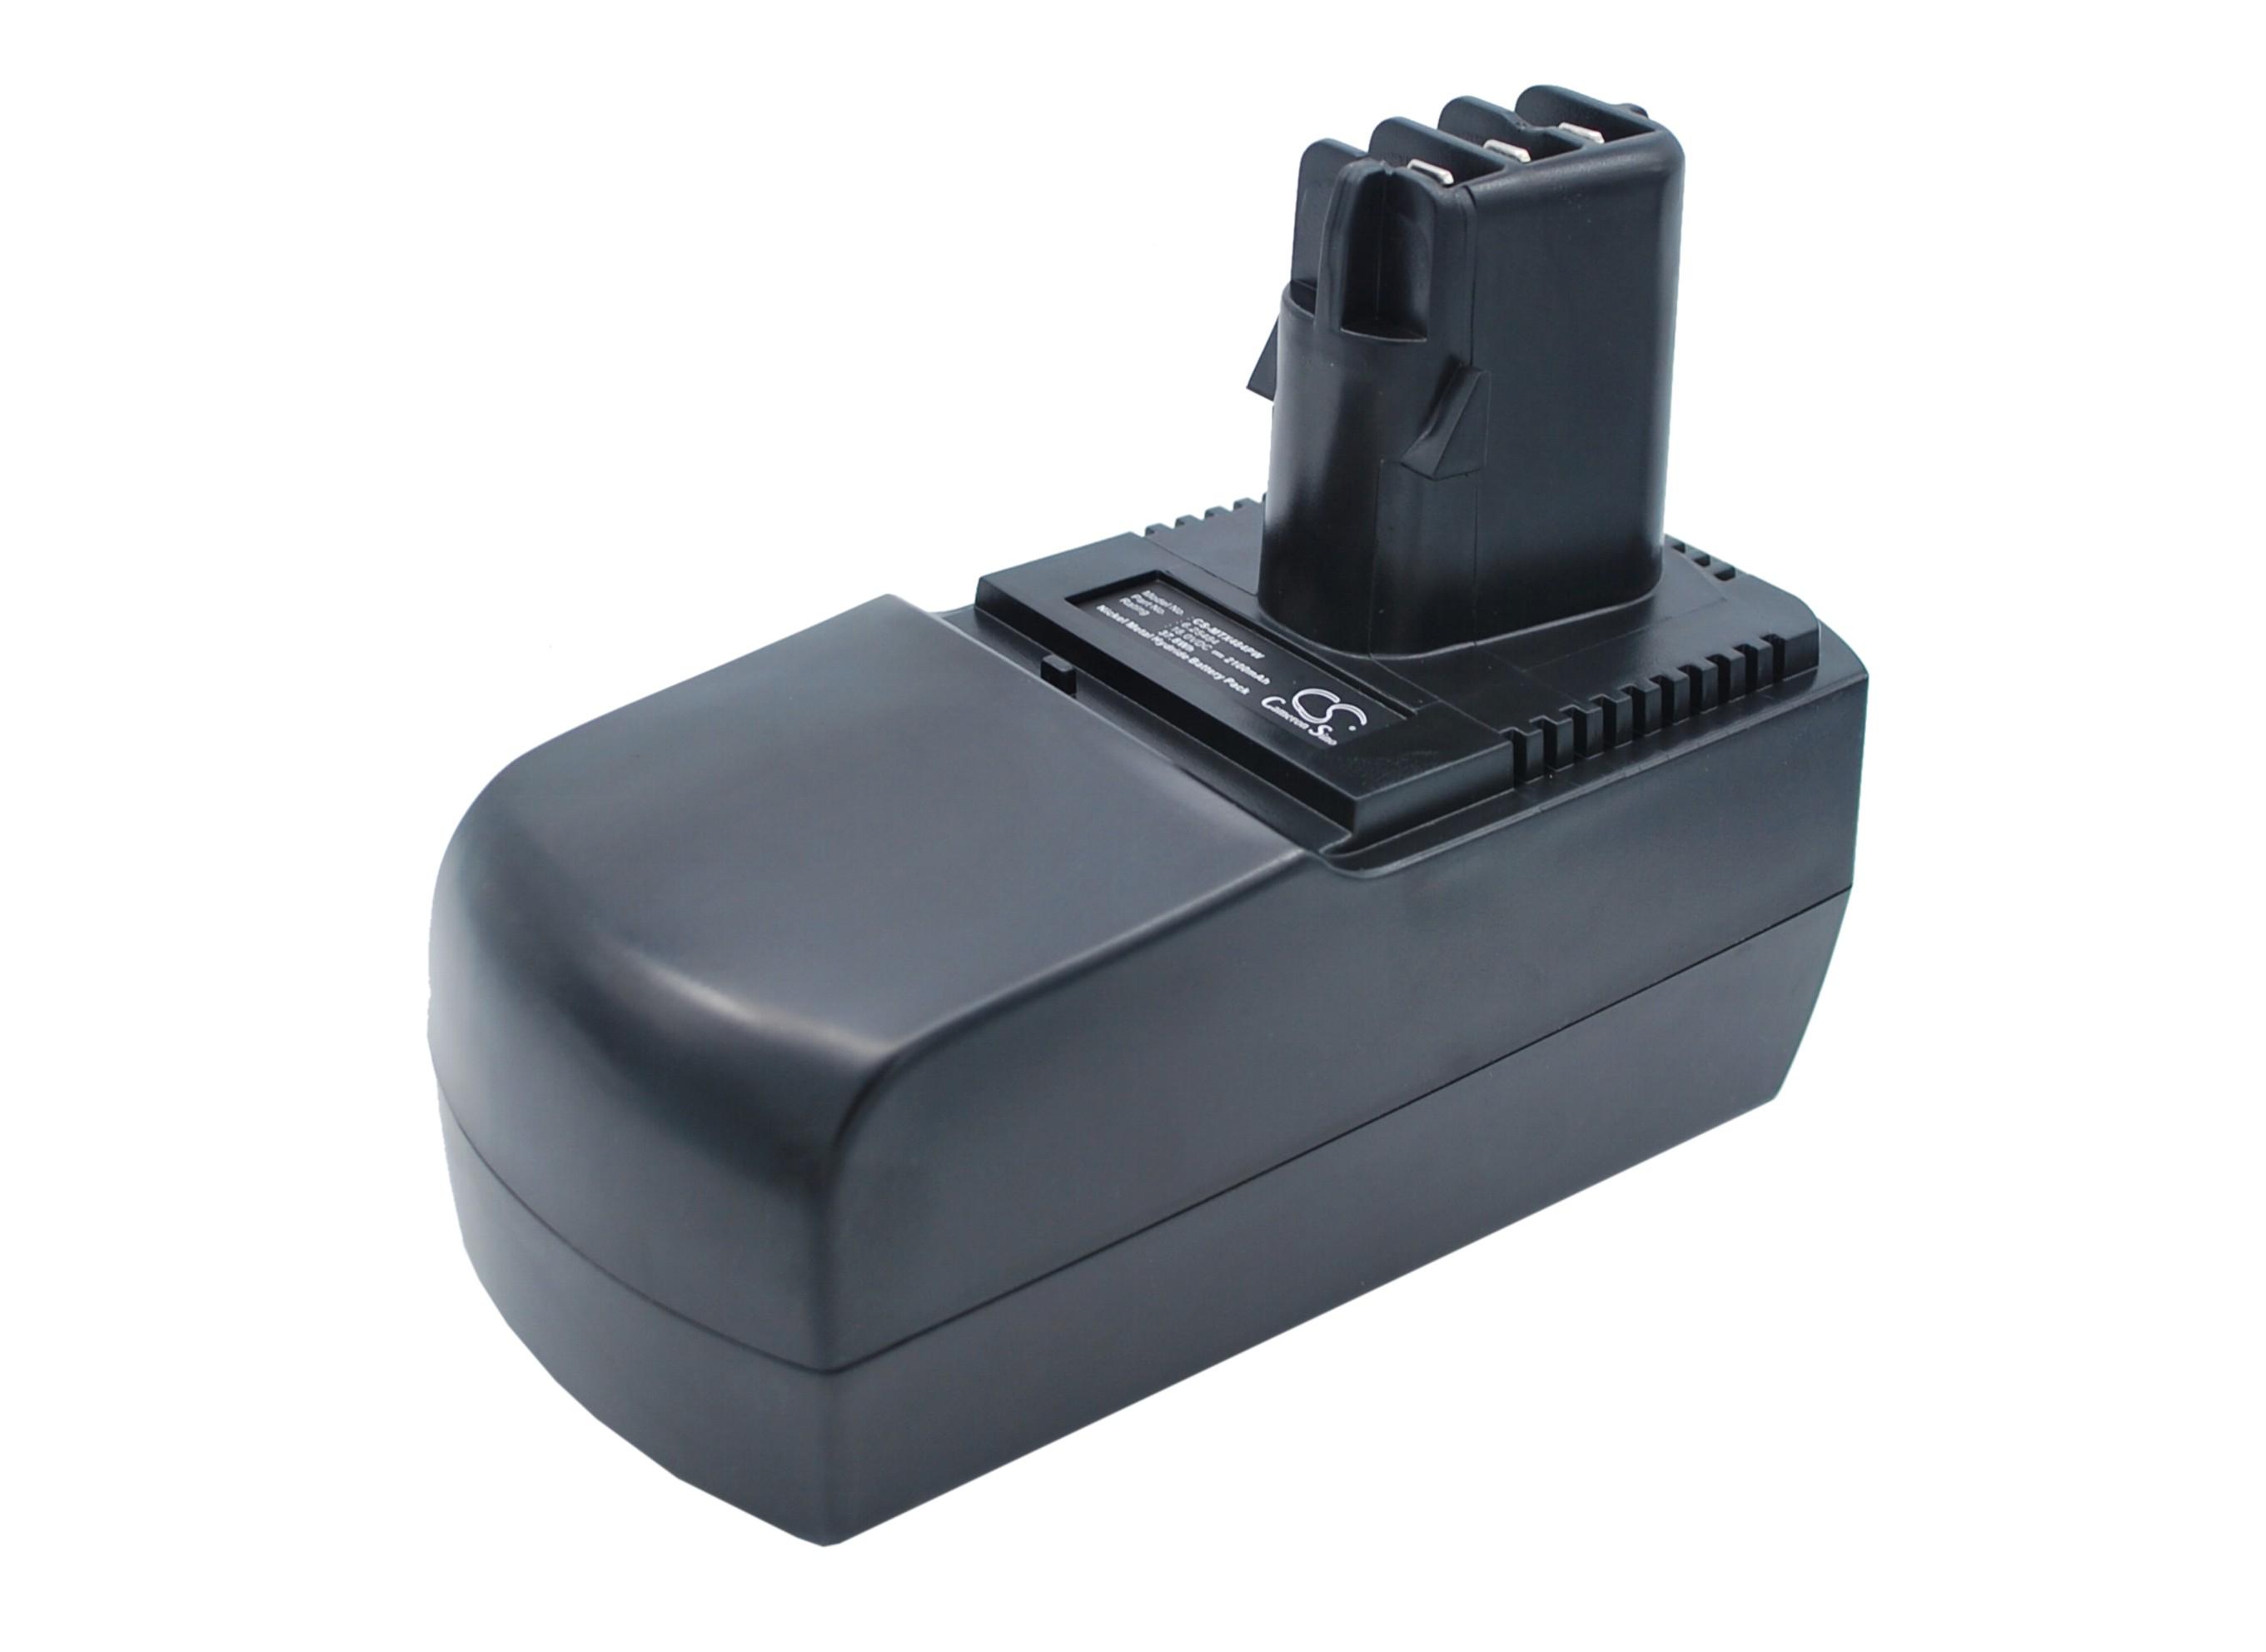 Cameron Sino baterie do nářadí pro METABO BSZ 18 Impuls Li Power 18V Ni-MH 2100mAh černá - neoriginální